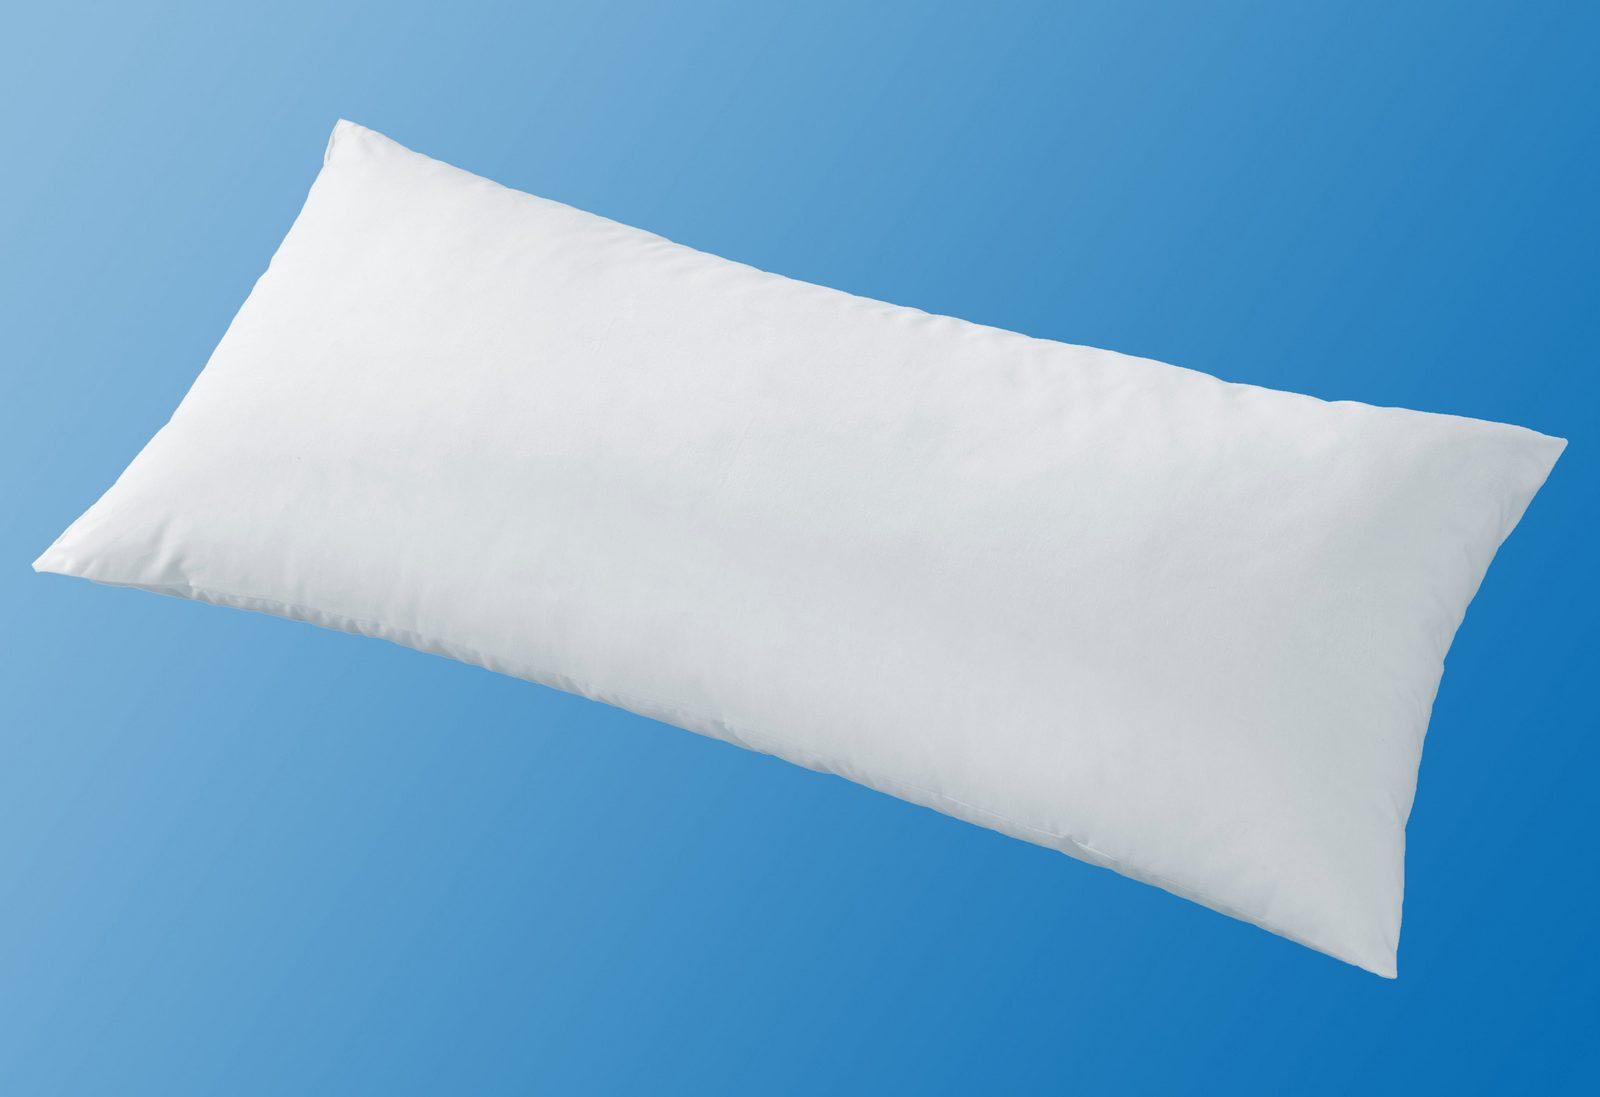 Feder-/Faserkopfkissen, »Natural HYBRID«, Ribeco, 50% Federn, Polyester-Faserkügelchen